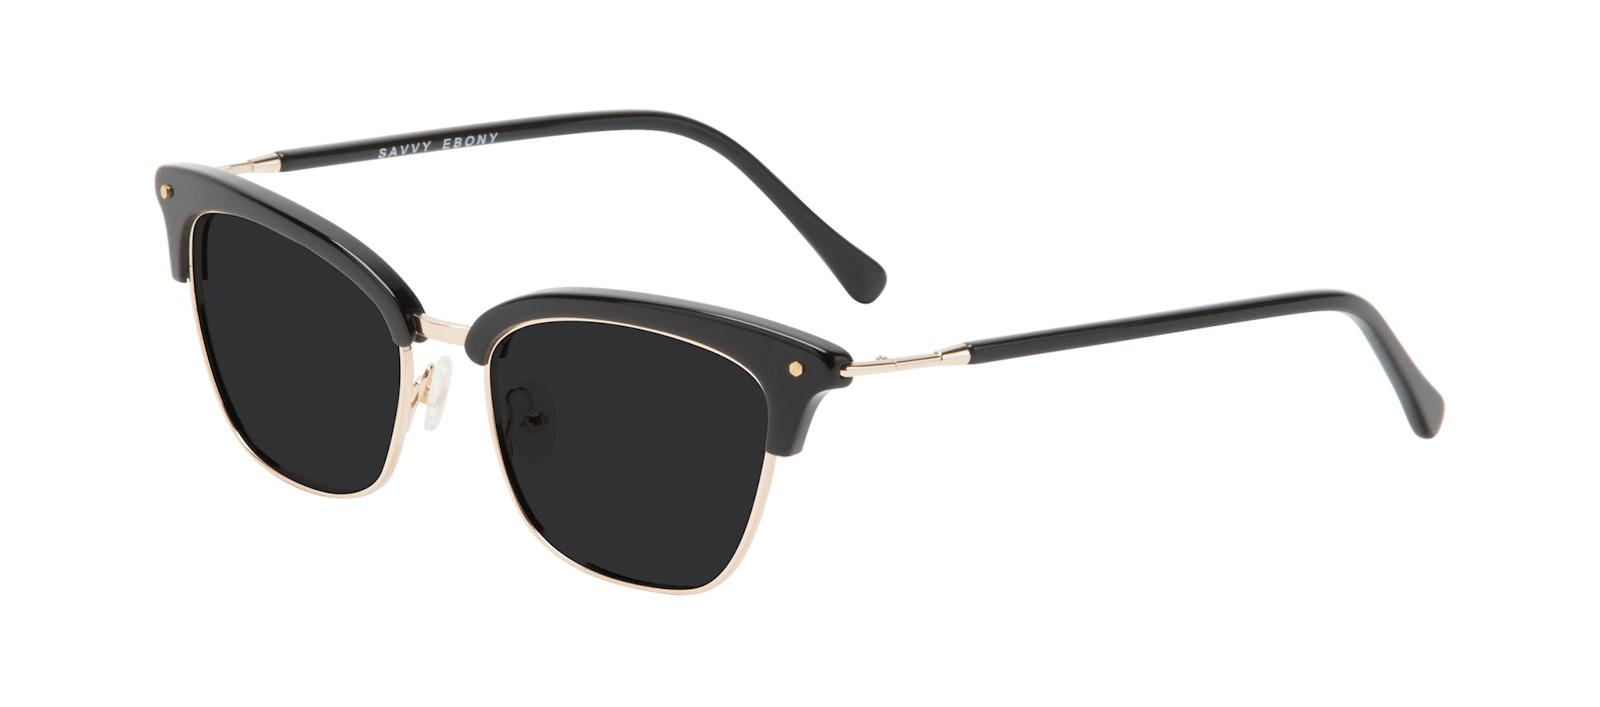 Affordable Fashion Glasses Cat Eye Sunglasses Women Savvy Ebony Tilt